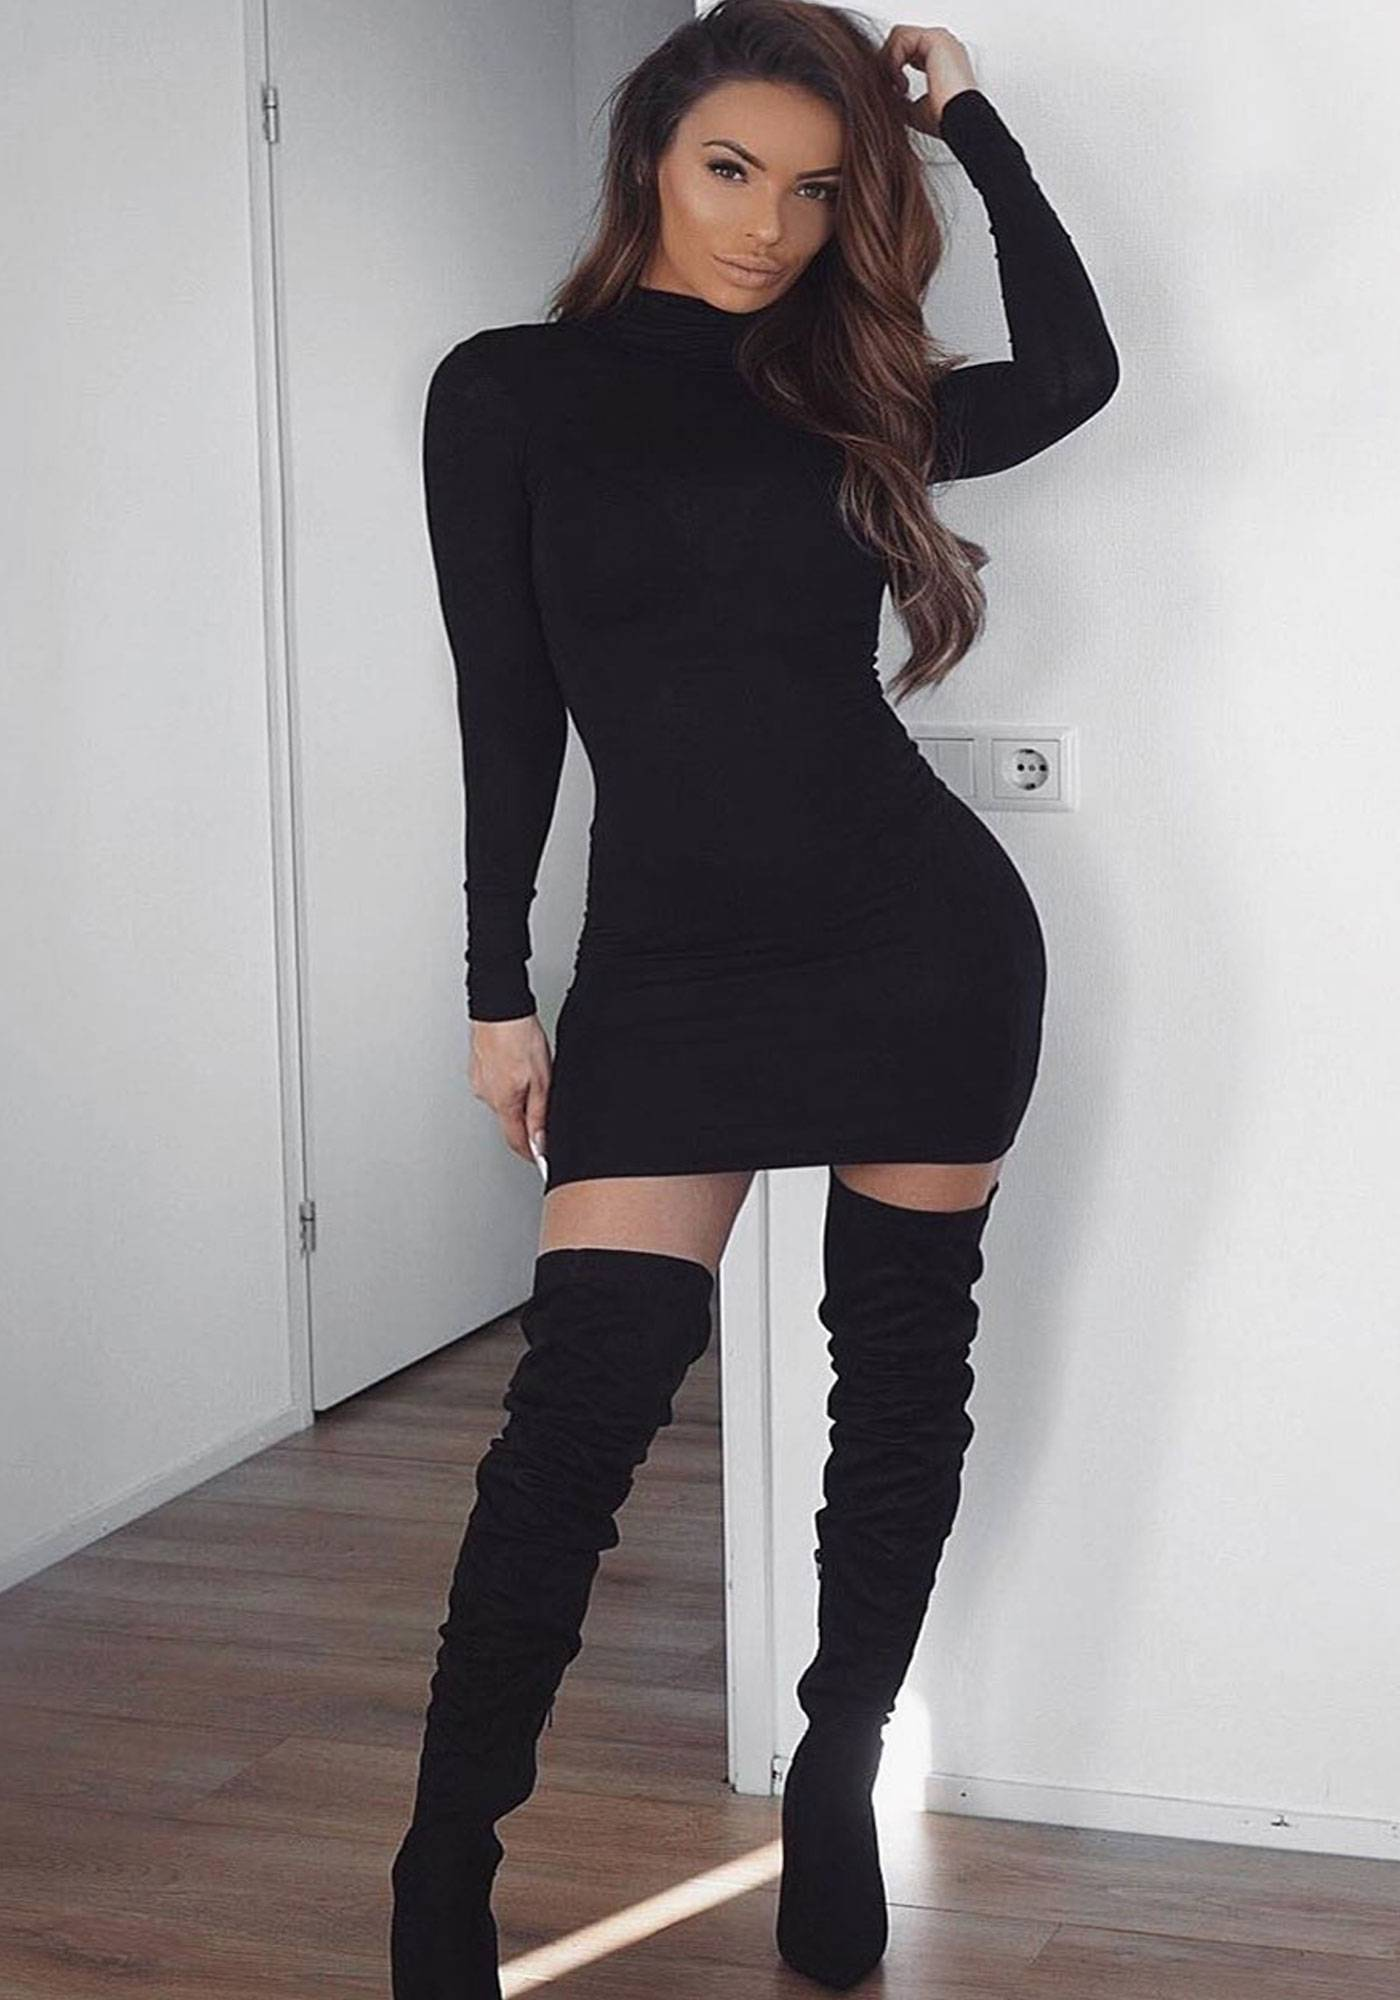 Image of Parisian High Neck Long Sleeve Bodycon Mini Dress In Black